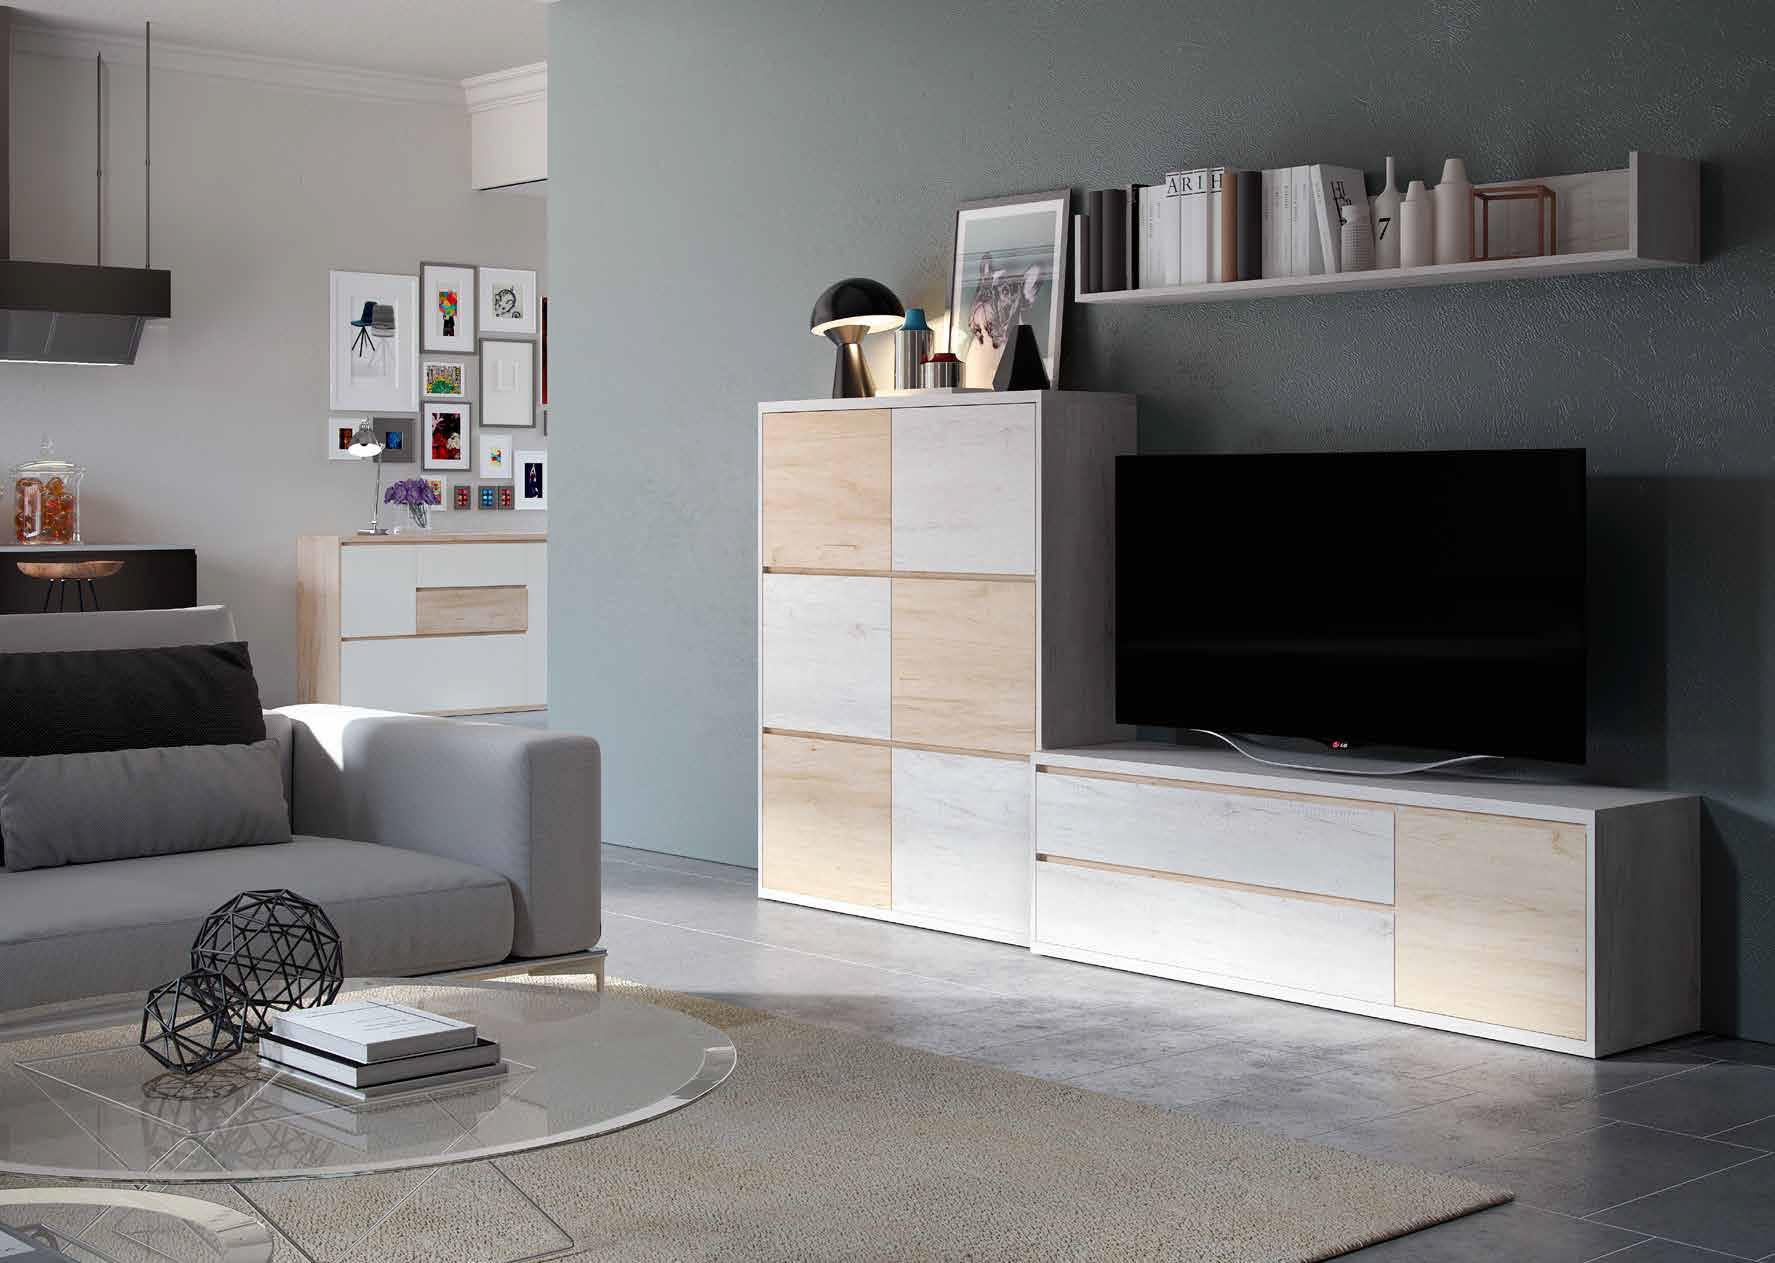 Compra online composici n muebles de sal n 5 am rica for Muebles compra